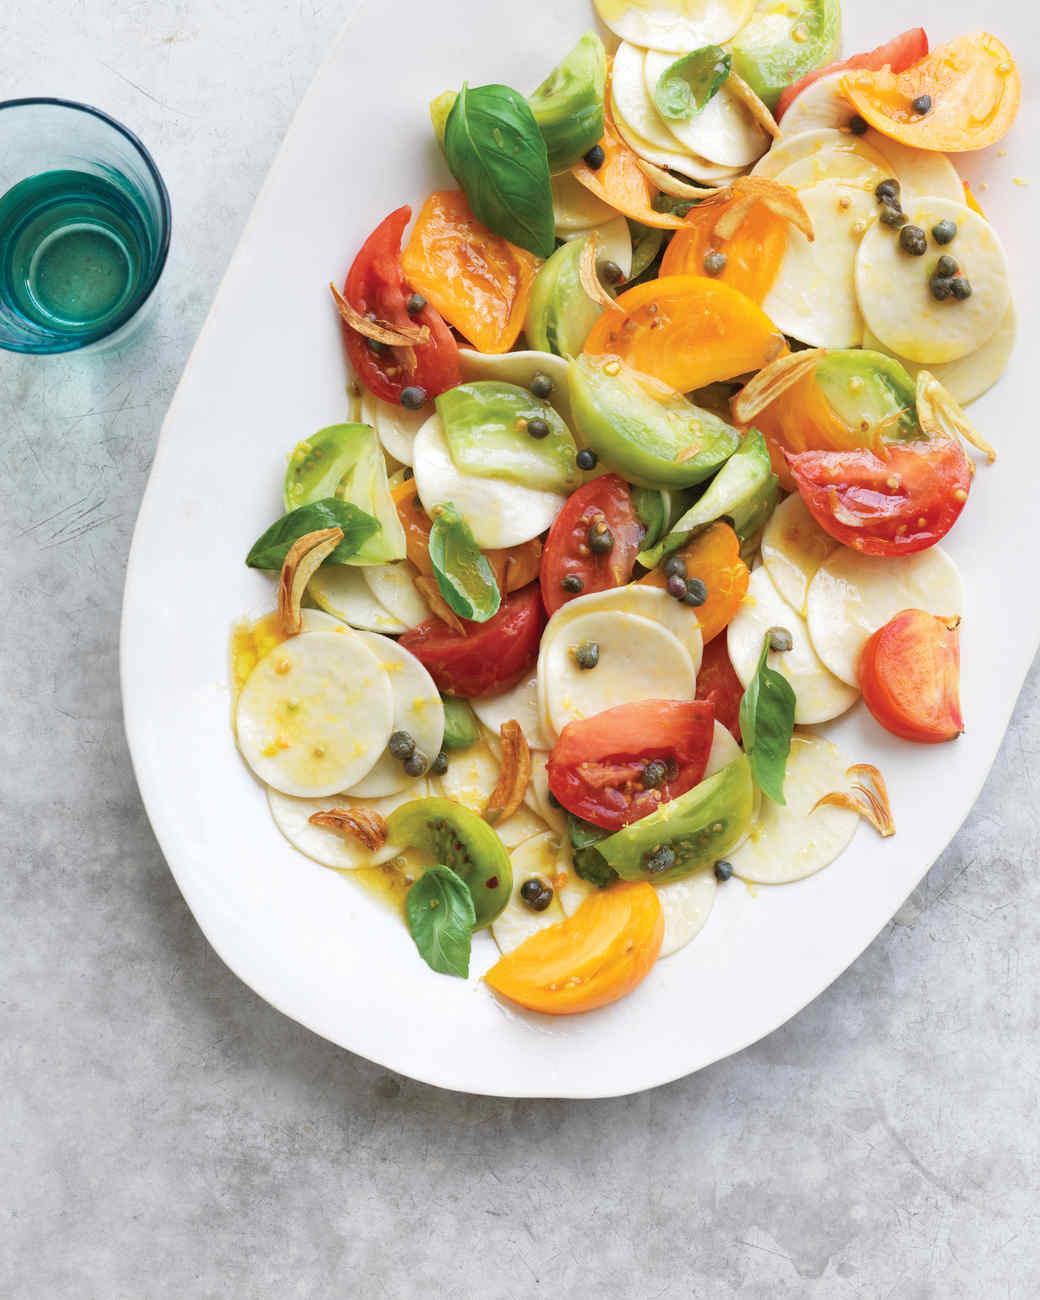 croxetti-tomatoes-0811mld107466.jpg